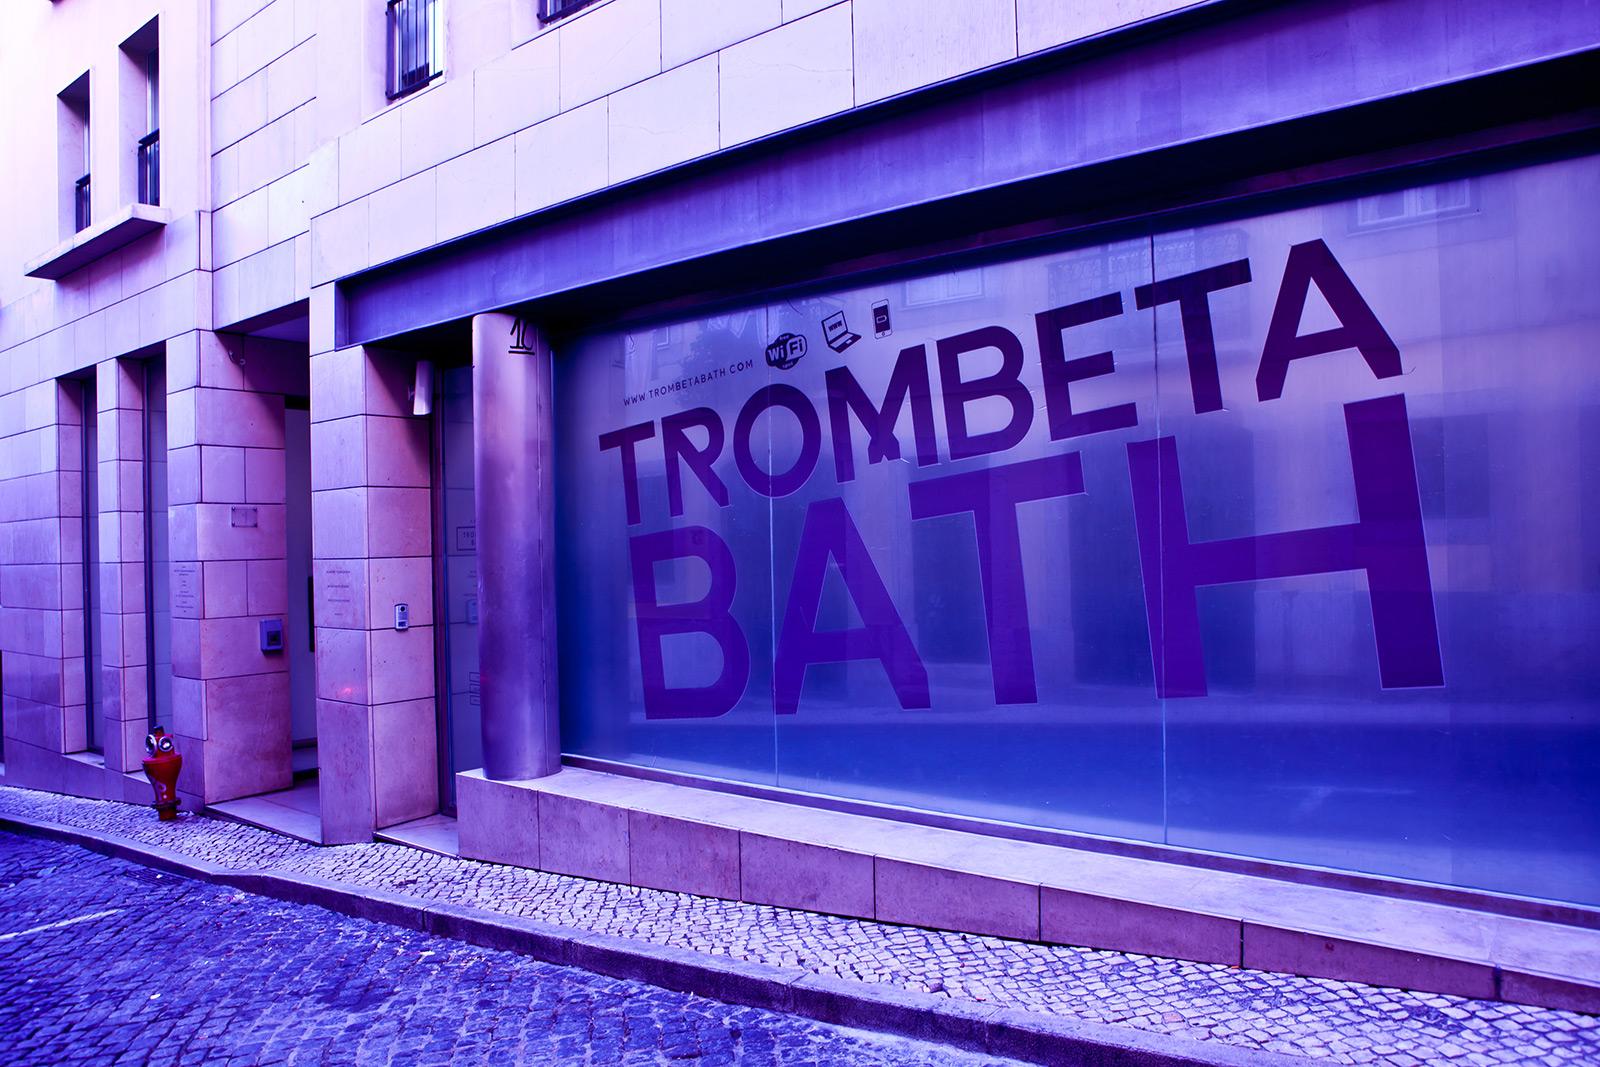 Entrance view for Trombeta Bath, Lisbon, Portugal